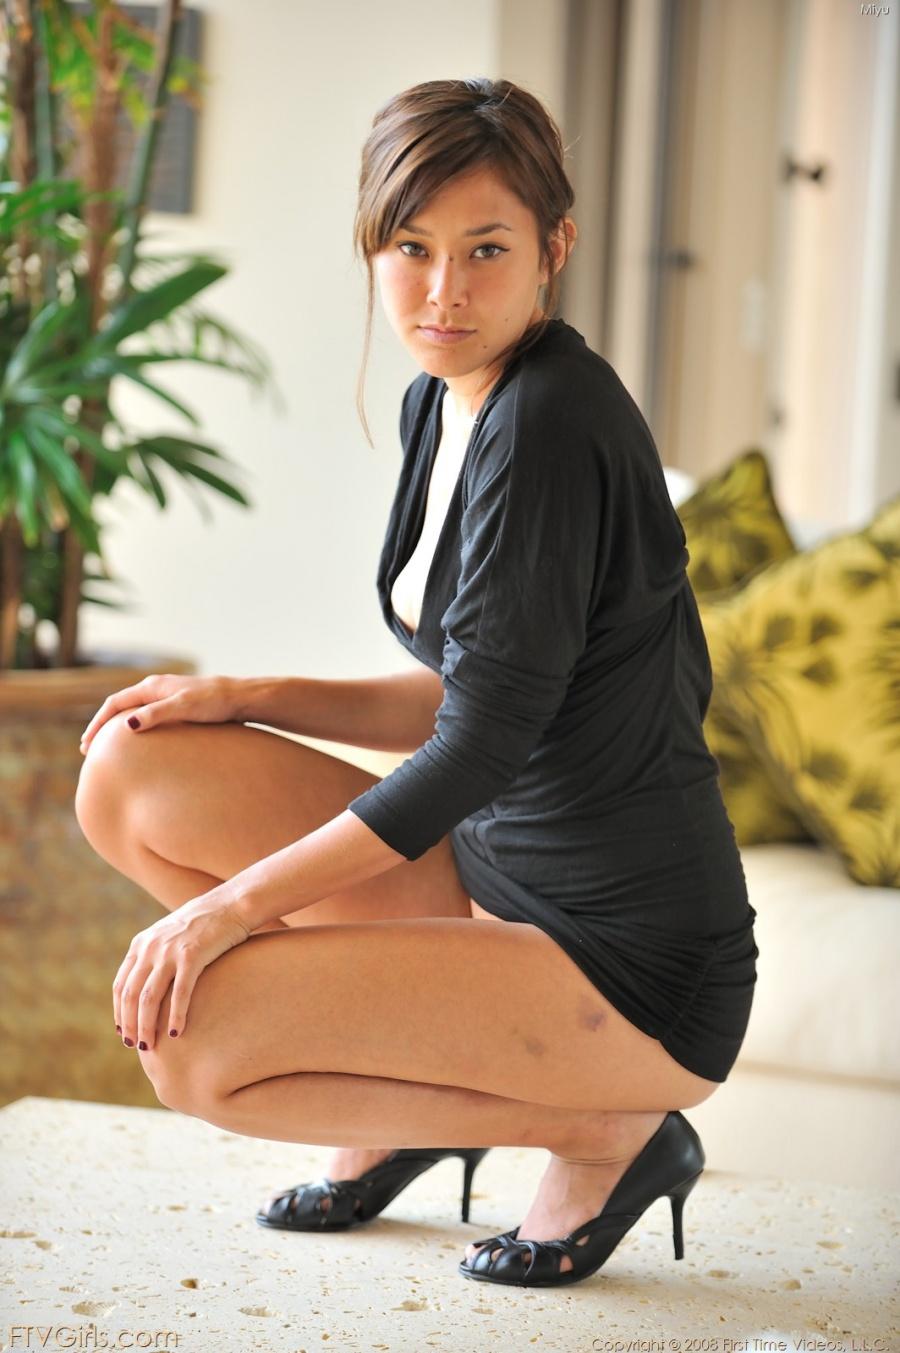 Miyu ftv girls sex porn, bitch black fucking